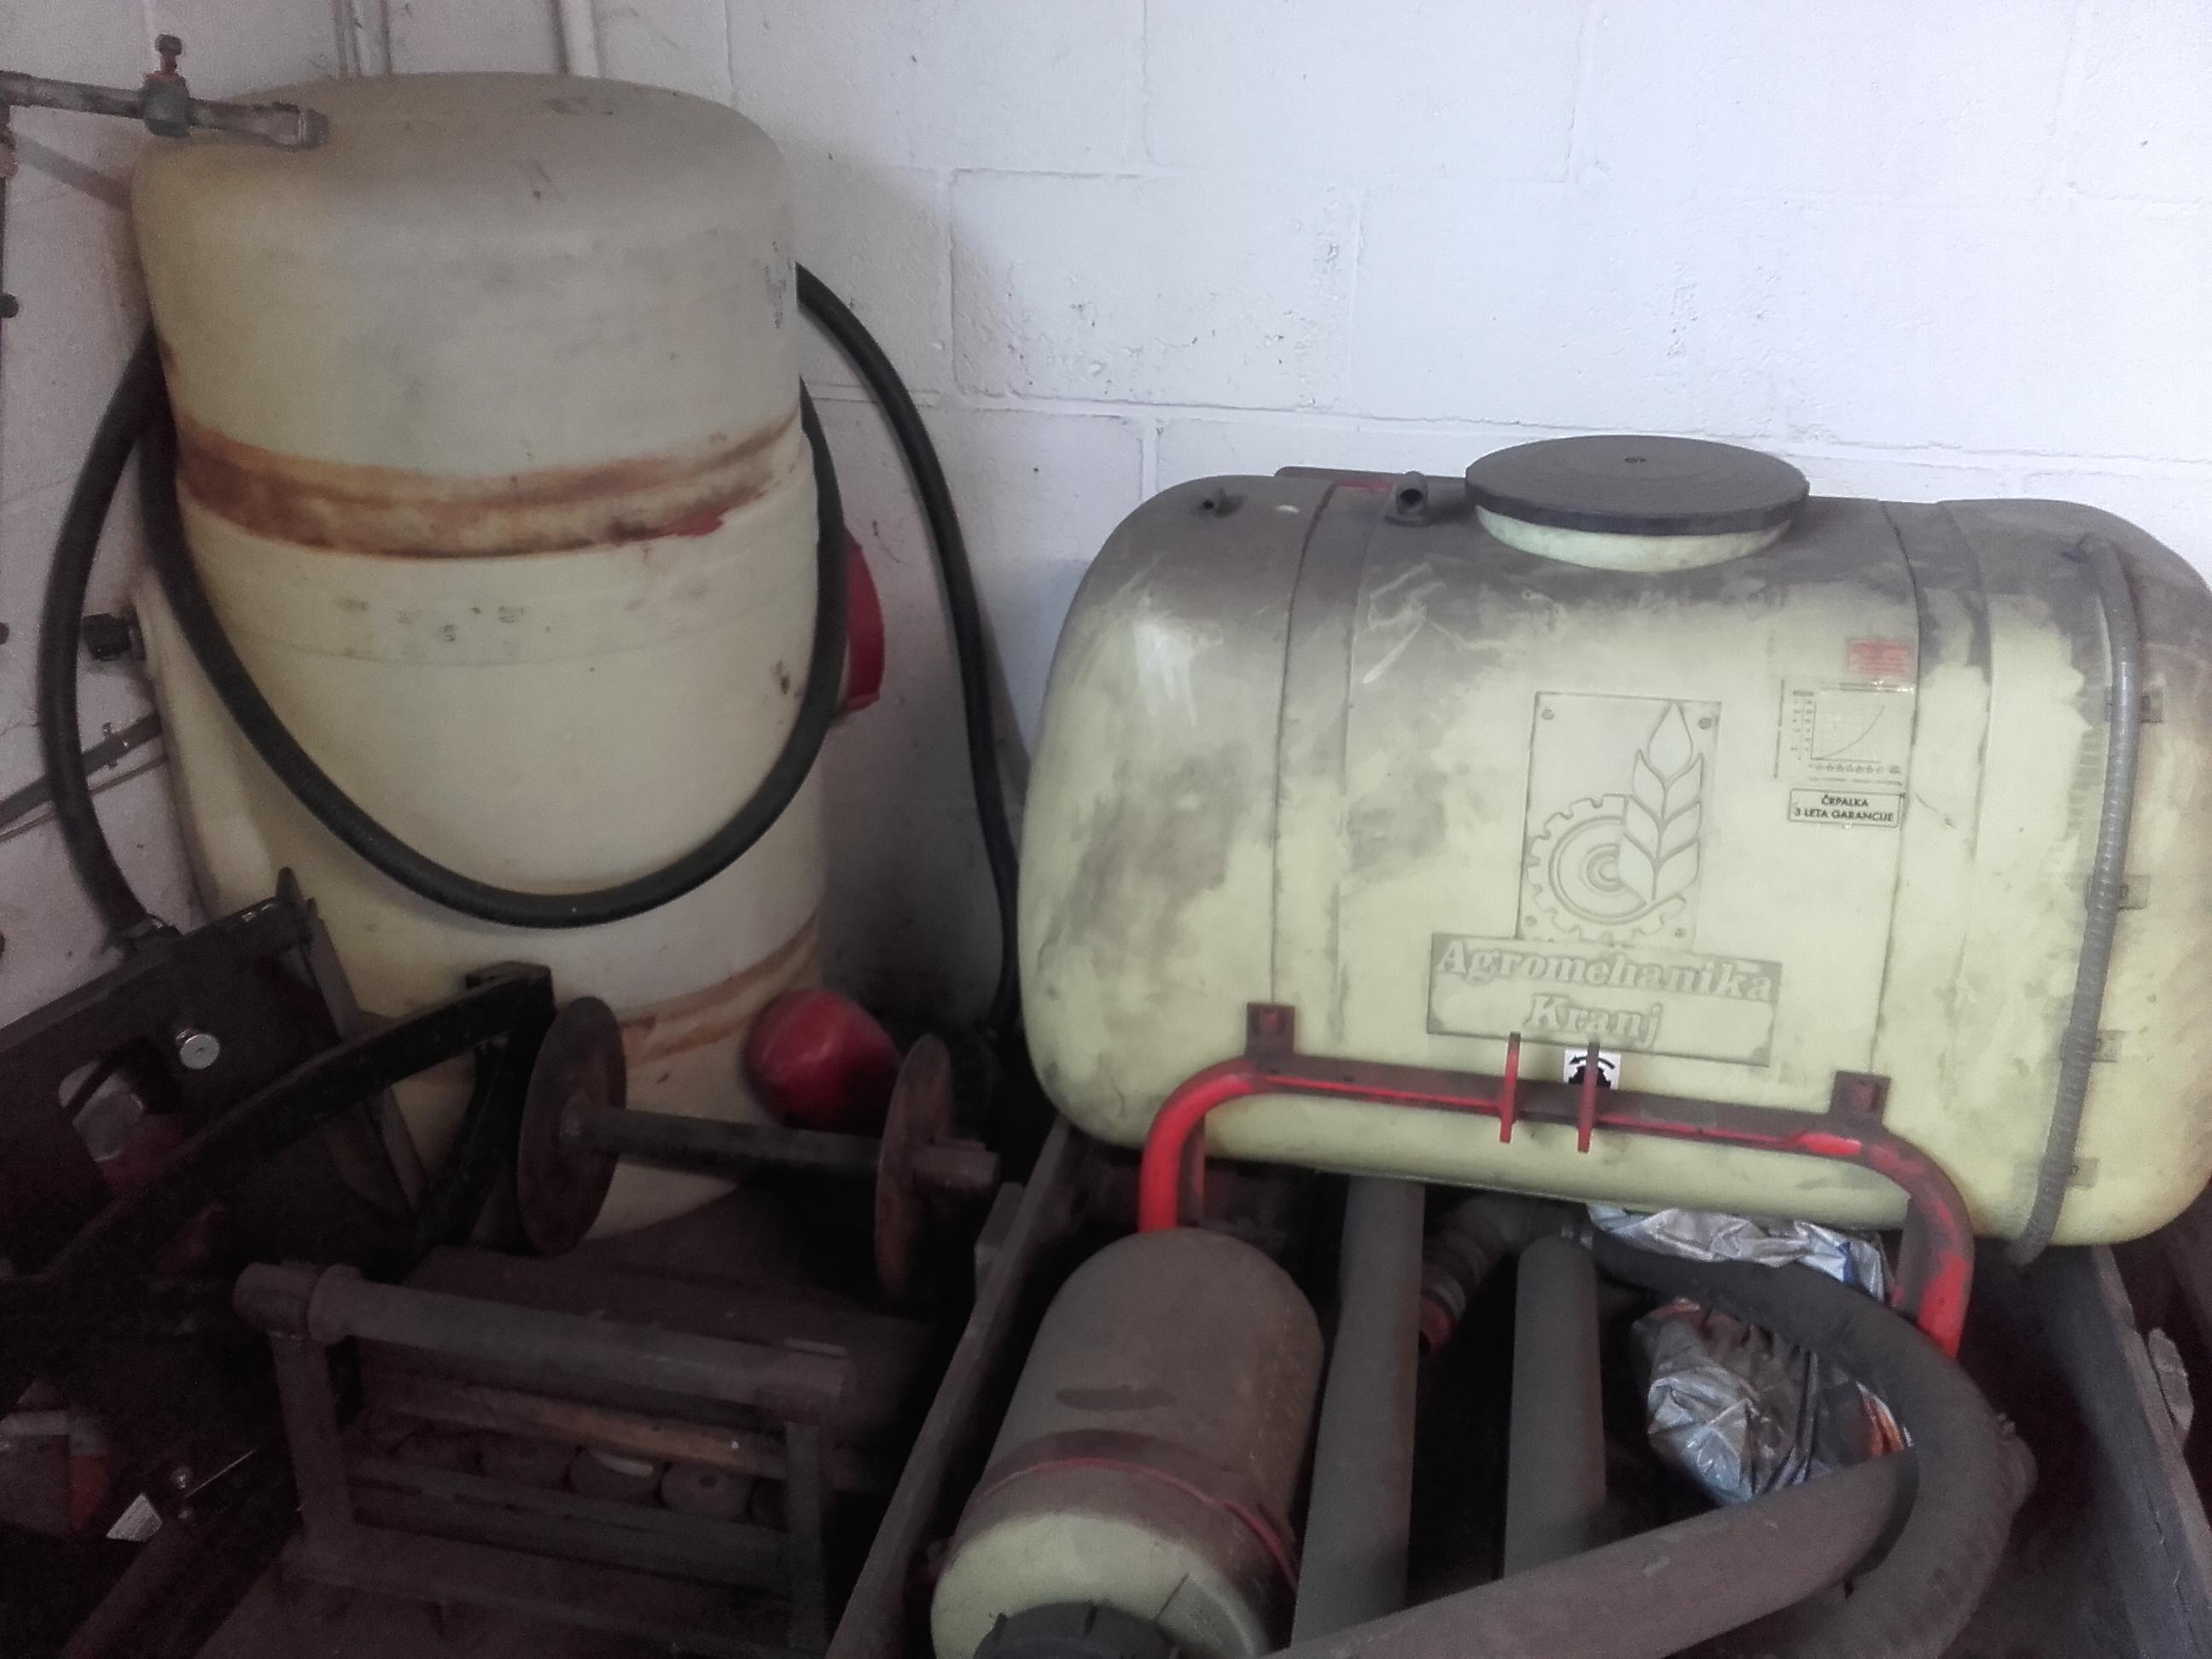 Vloeistoftanks gebruikt